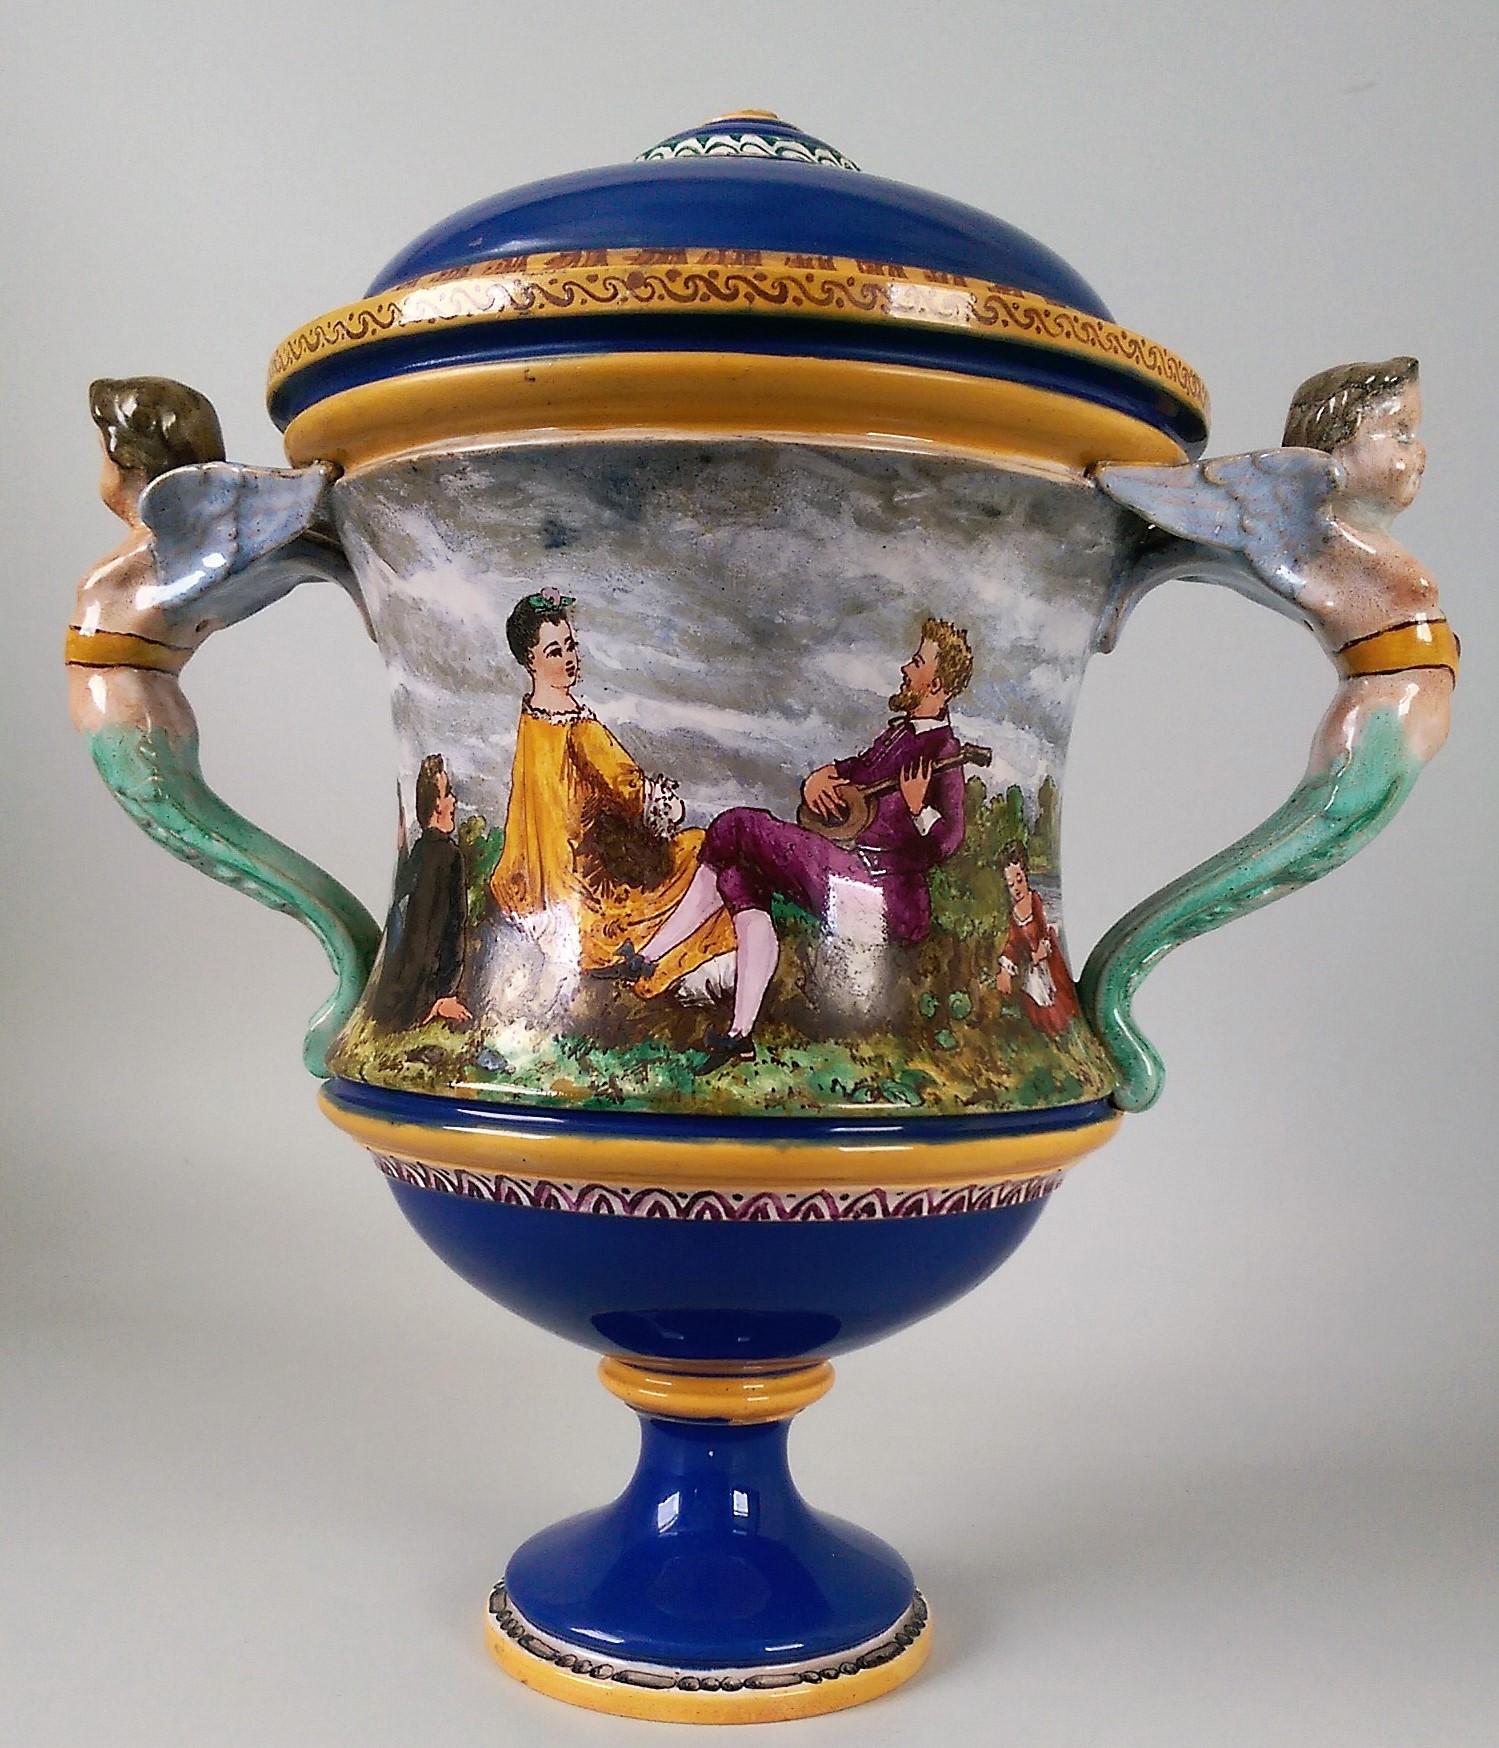 Minton vase, shape number 746 for tin-glaze majolica decoration.